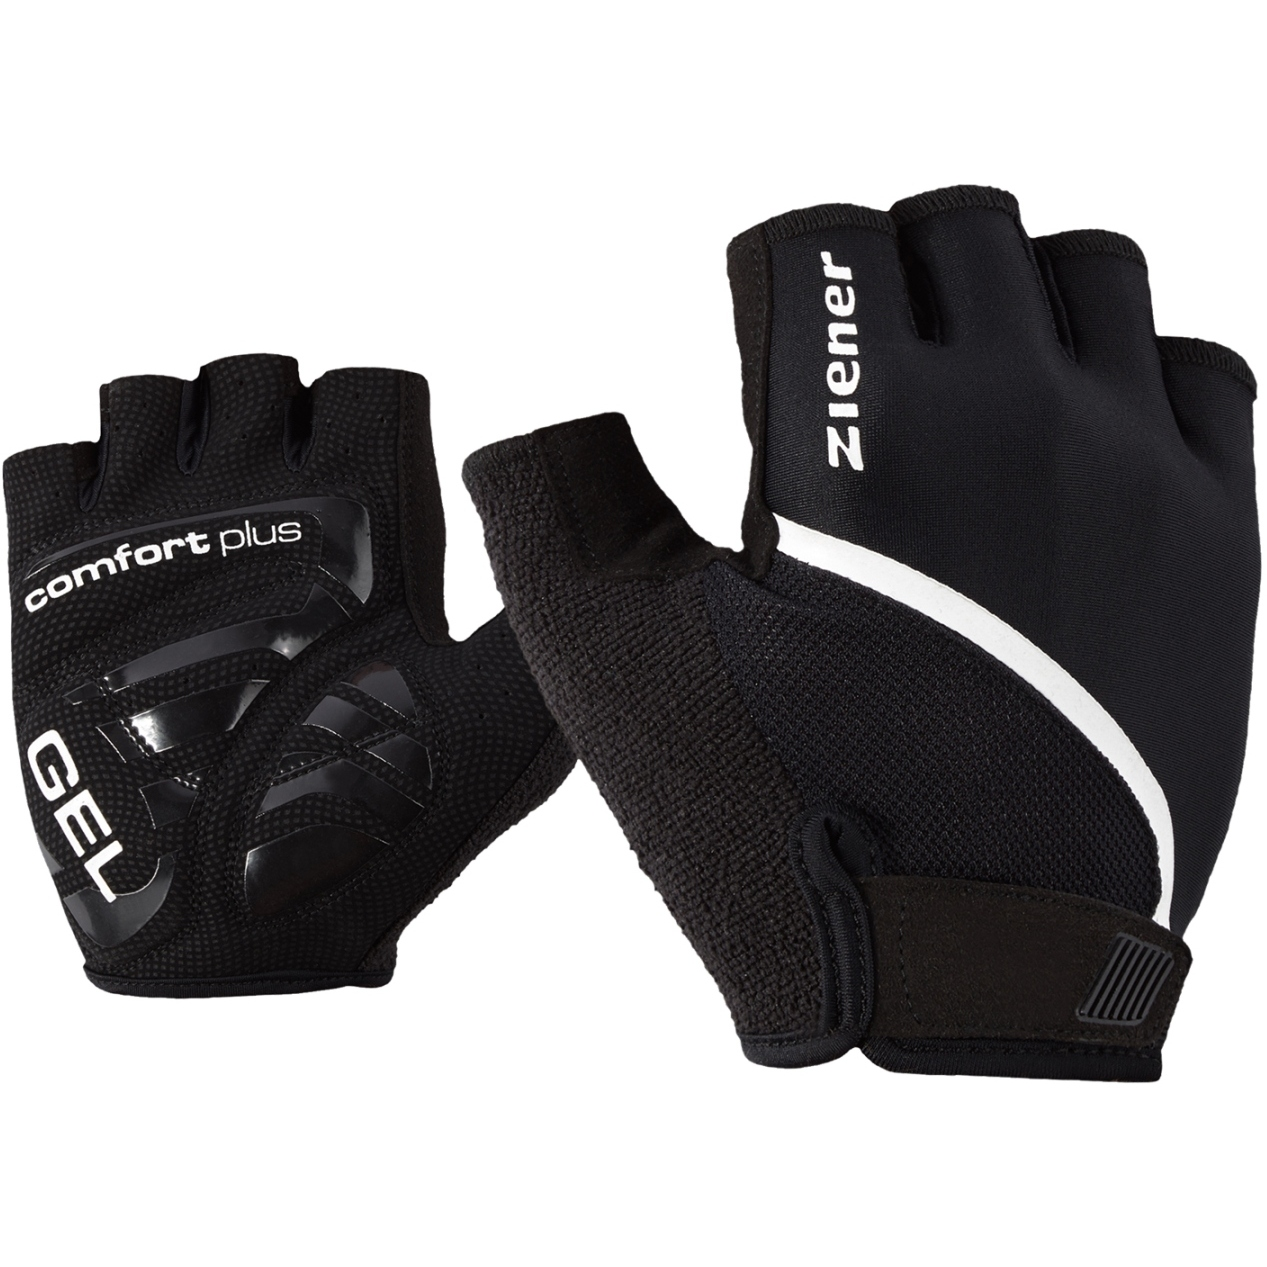 Ziener Celal Bike Glove - black